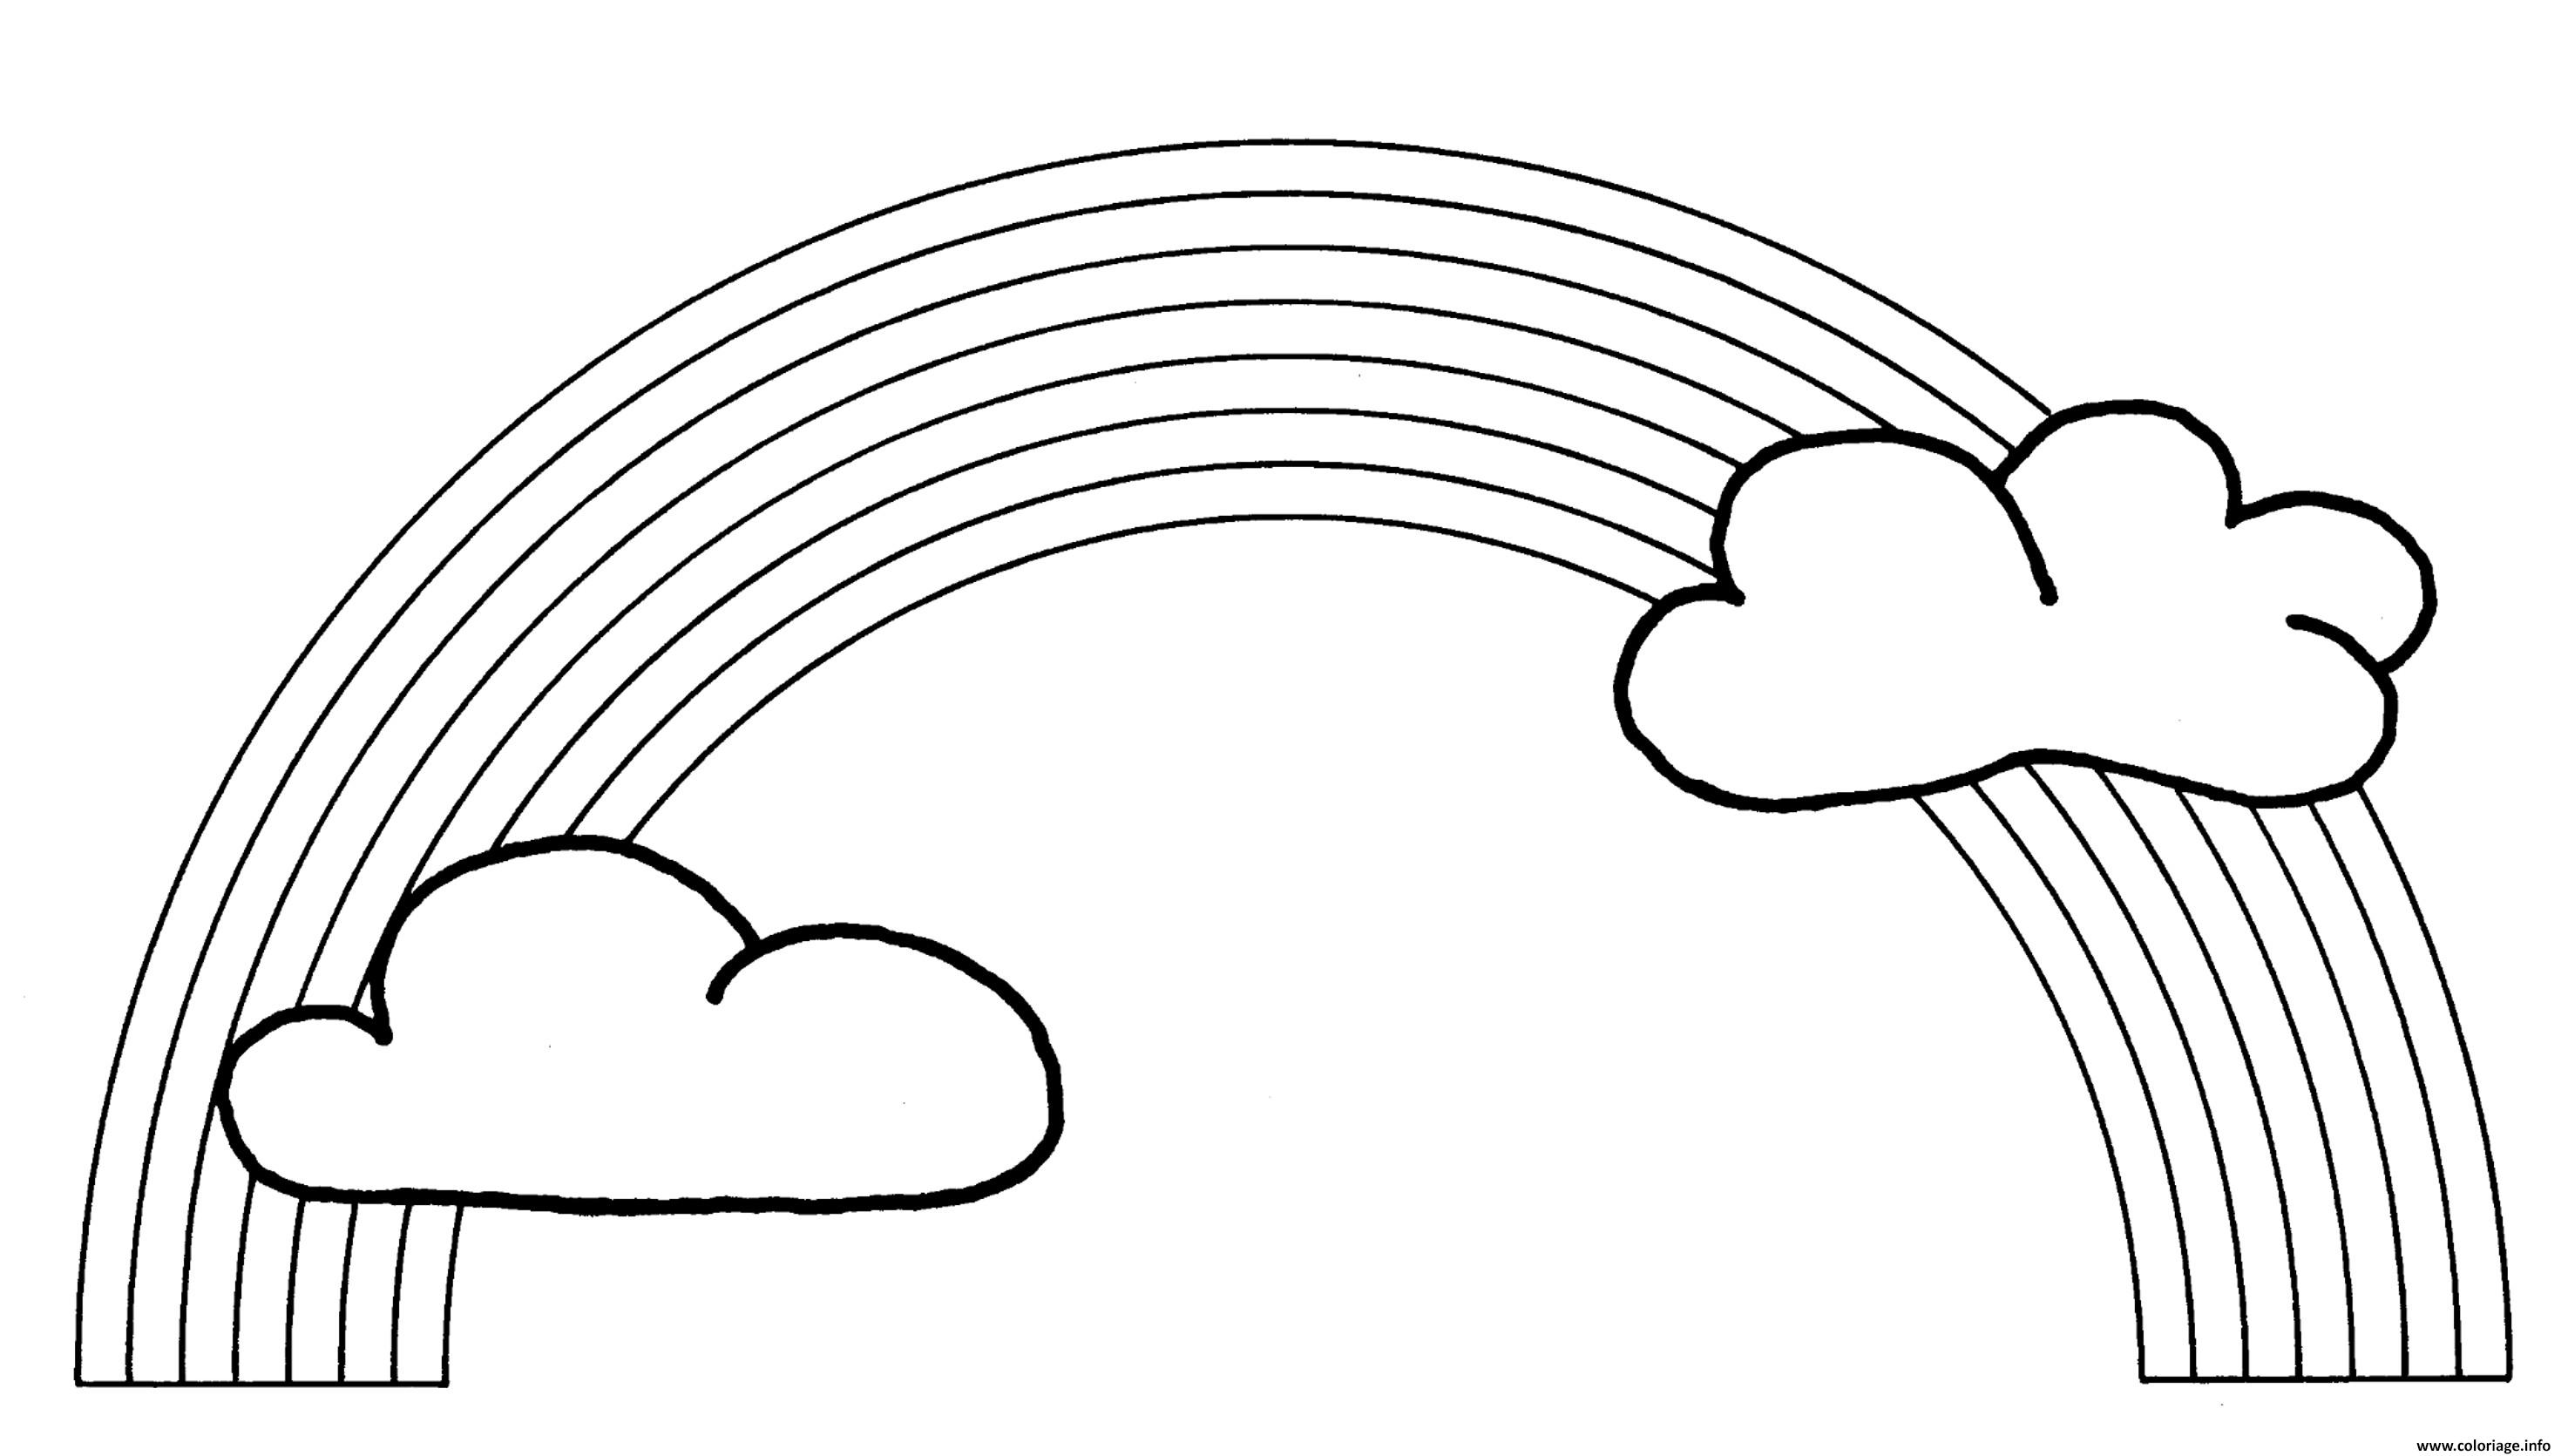 Coloriage Arc En Ciel Avec Nuage Dessin Arc En Ciel A Imprimer